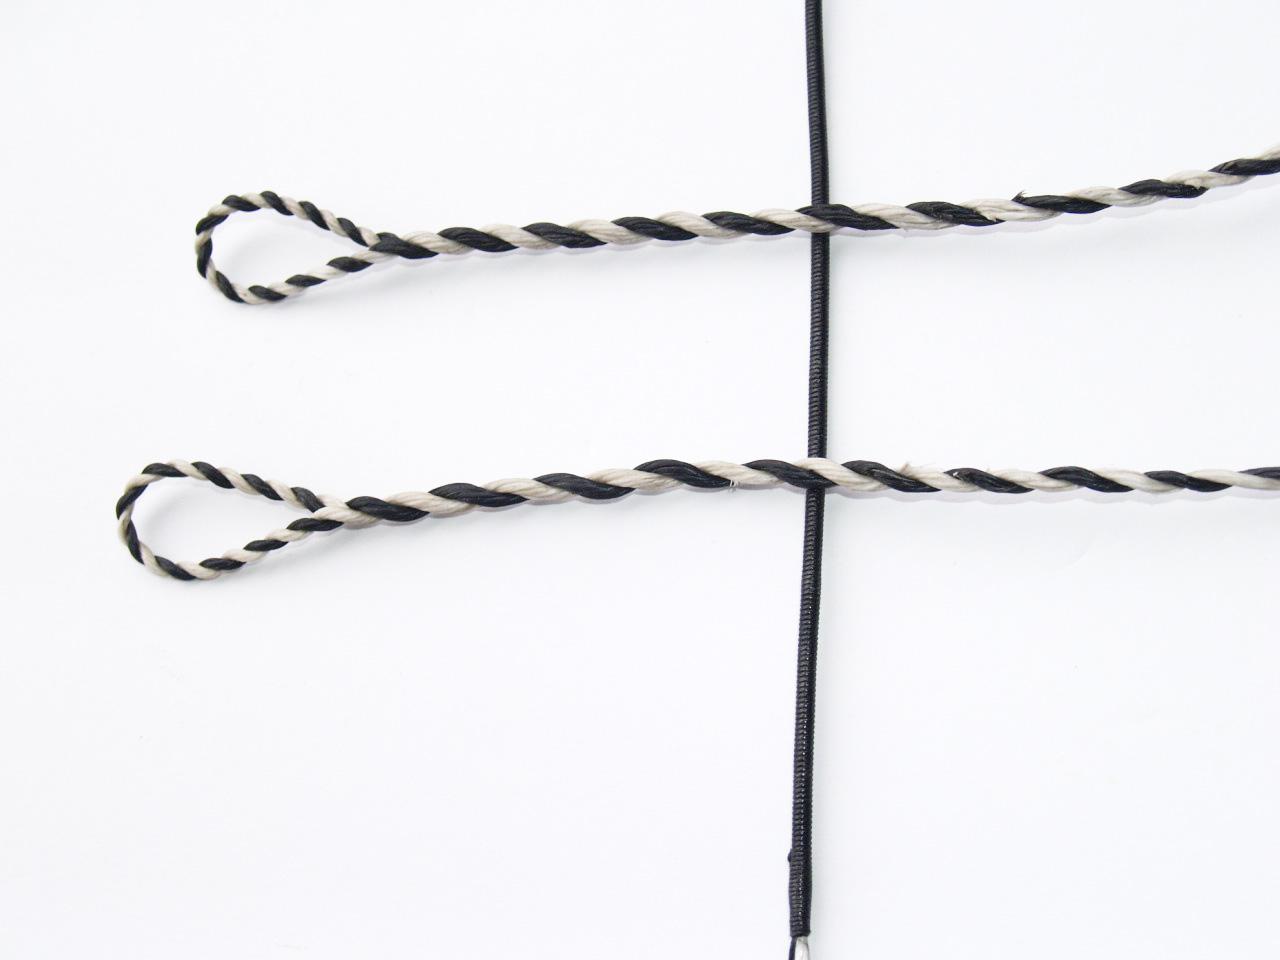 12-strand B55 Flemish Twist Bowstring